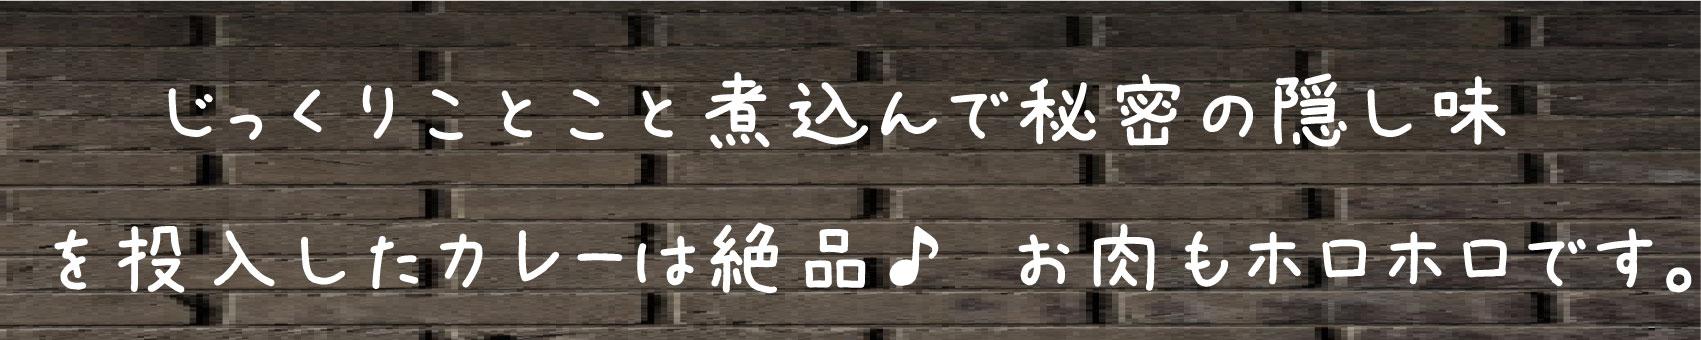 AnagraM 〒286-0028 千葉県成田市幸町409-5